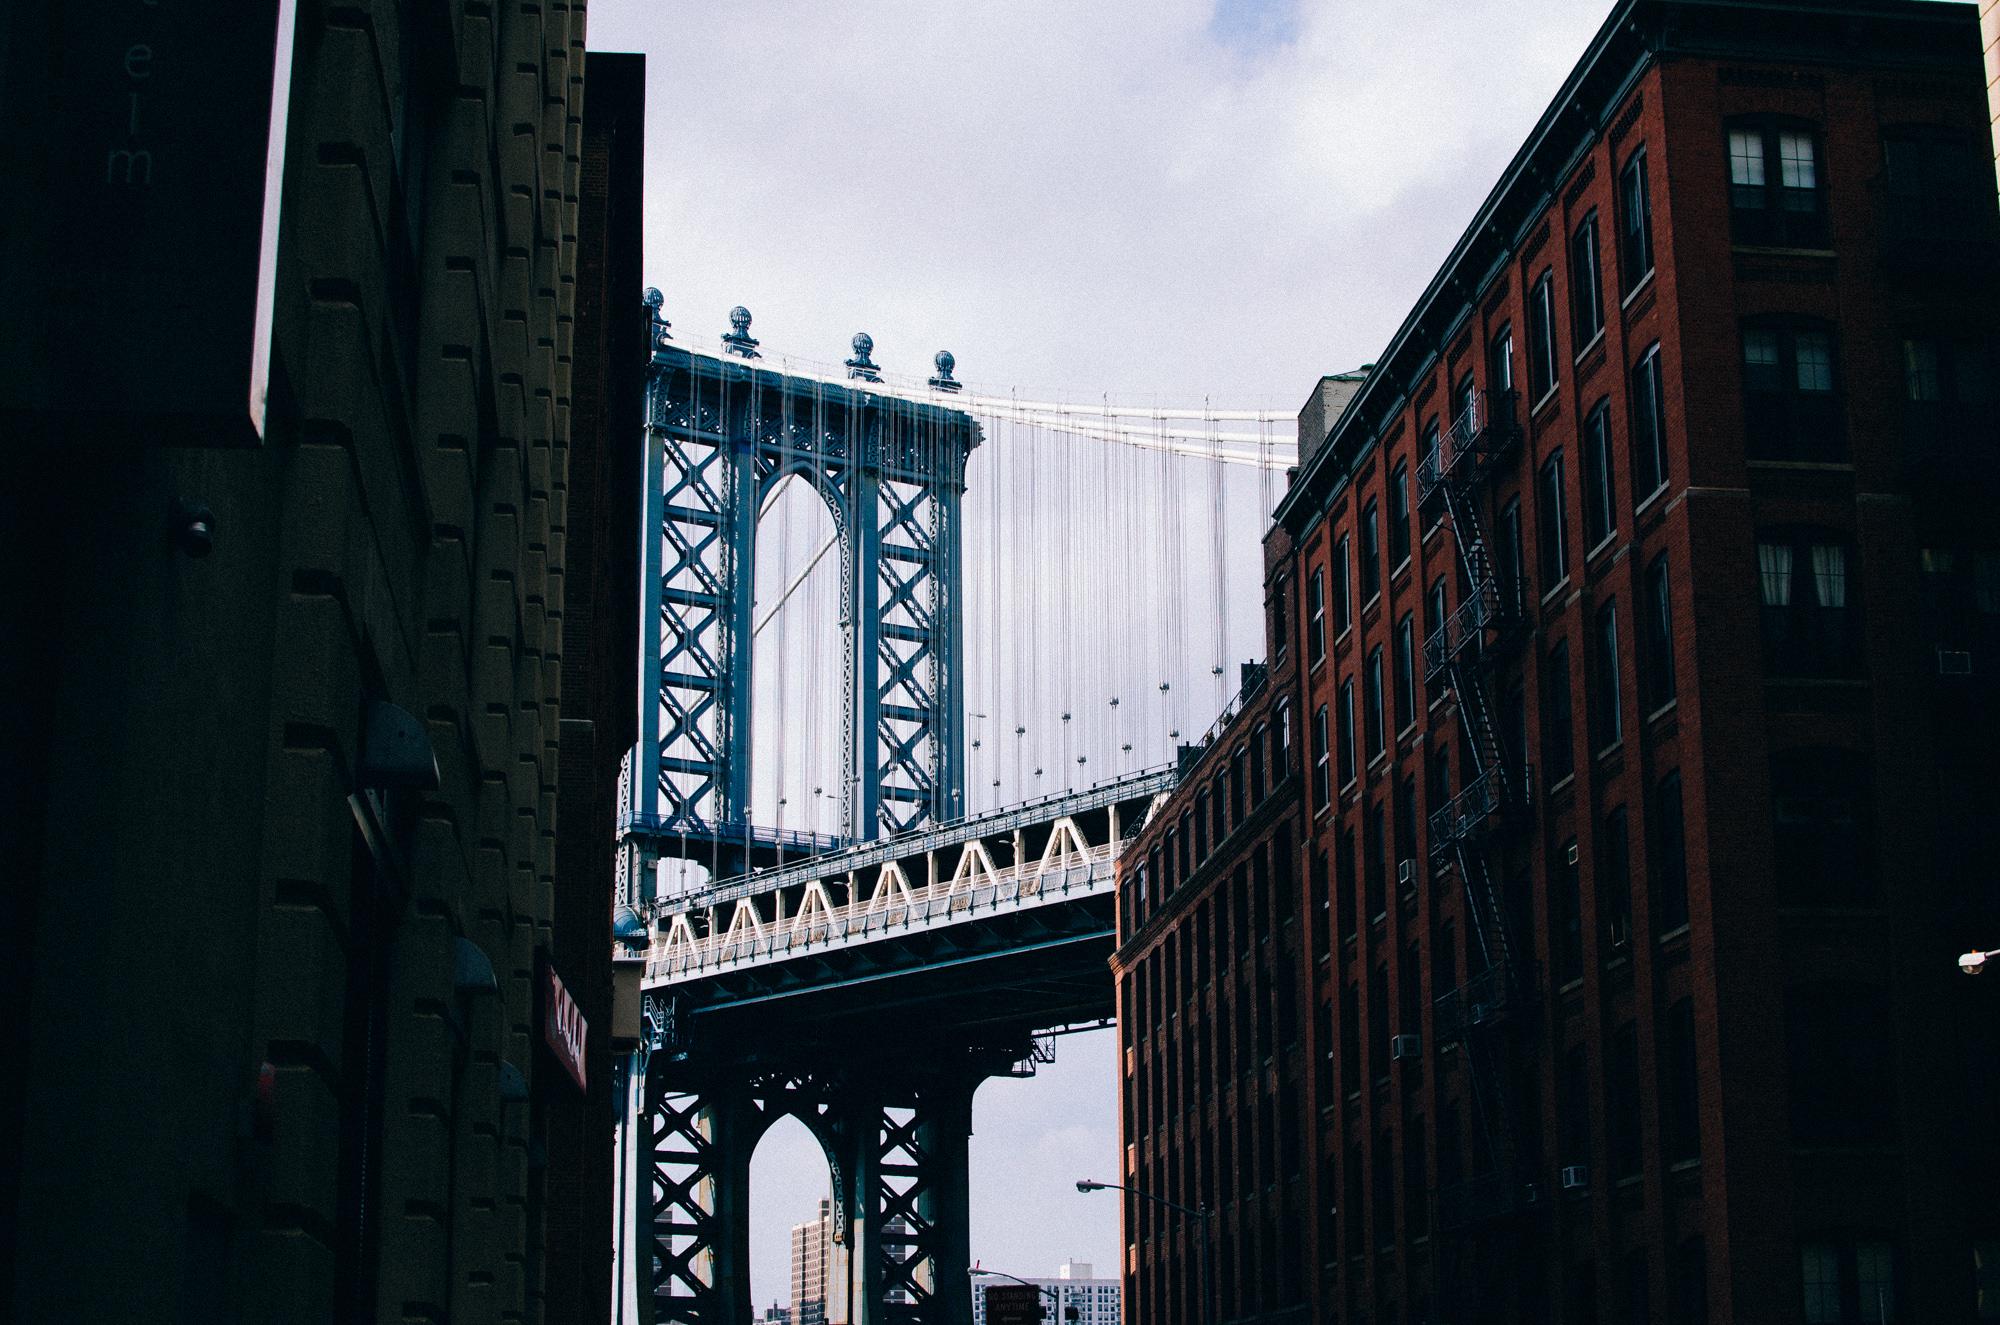 20140726_NYC-180.jpg